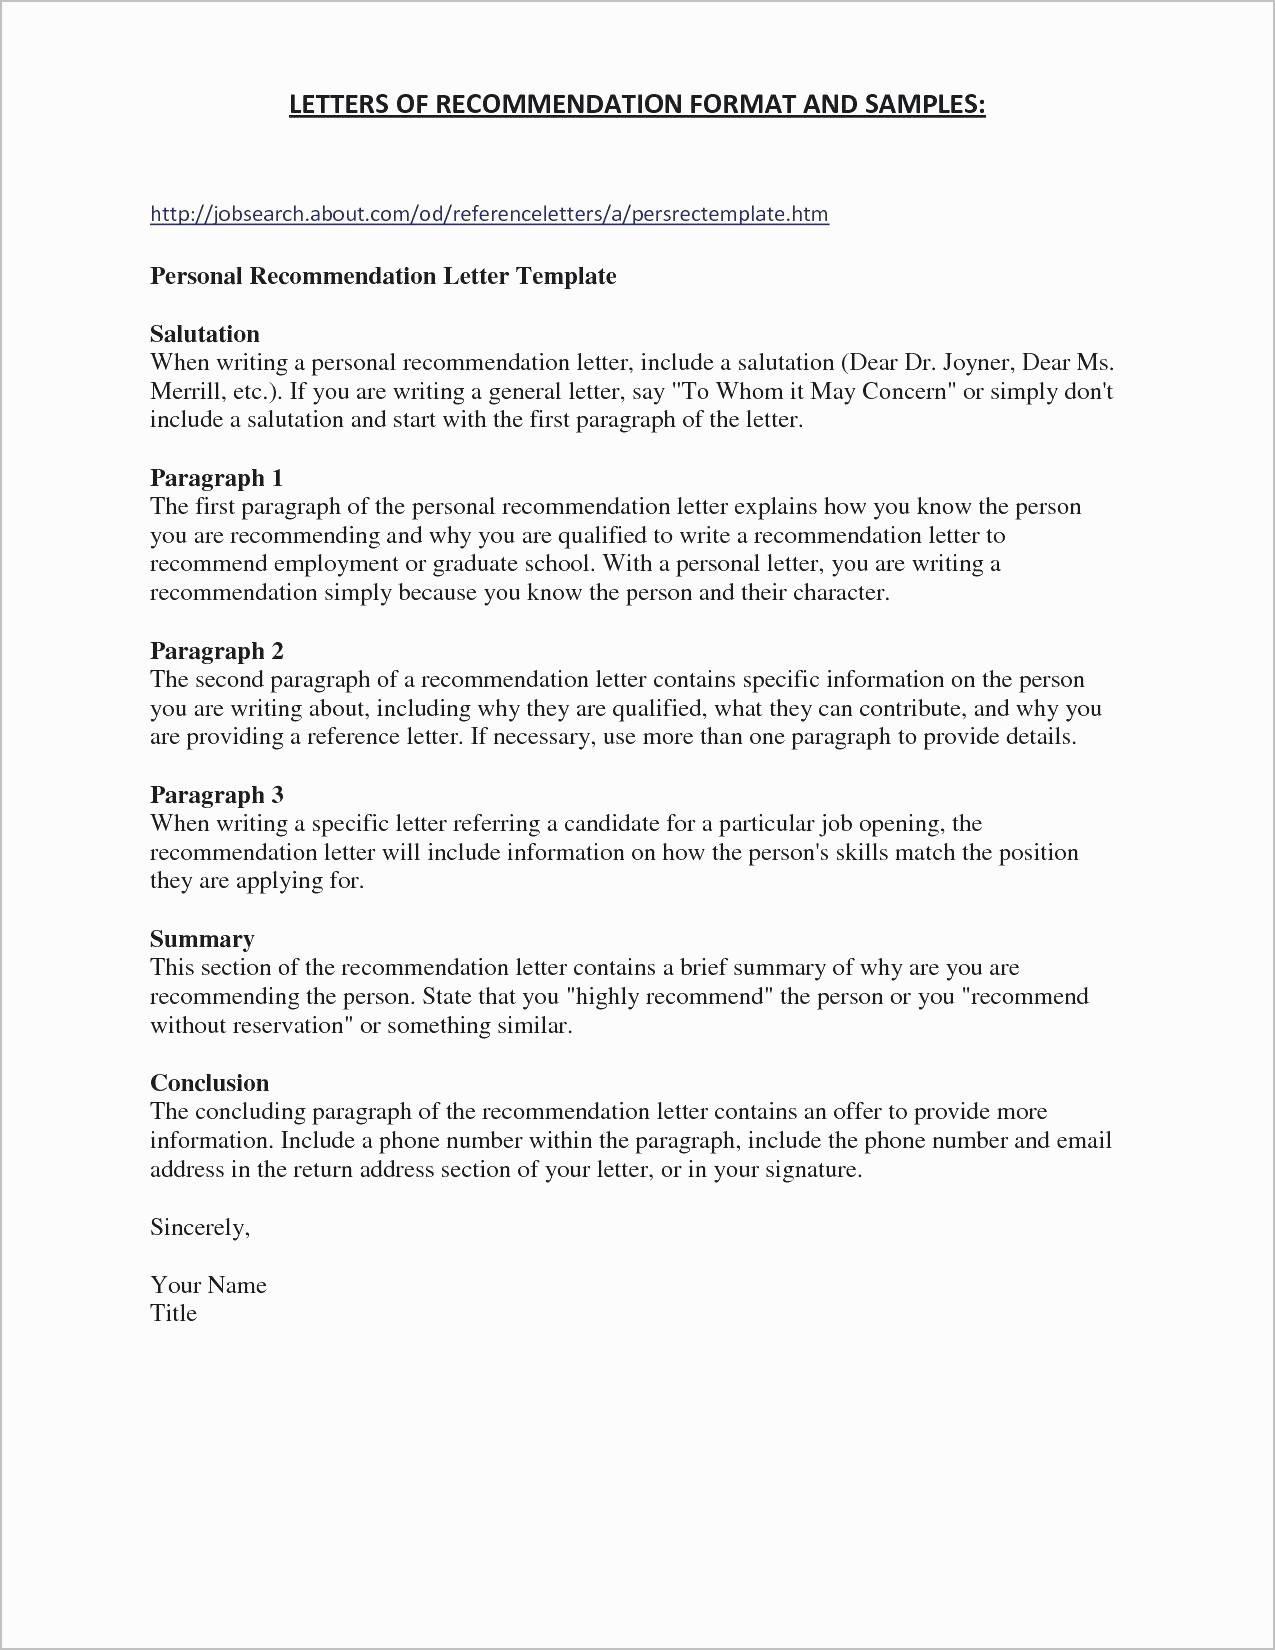 letter of transmittal template construction samples letter